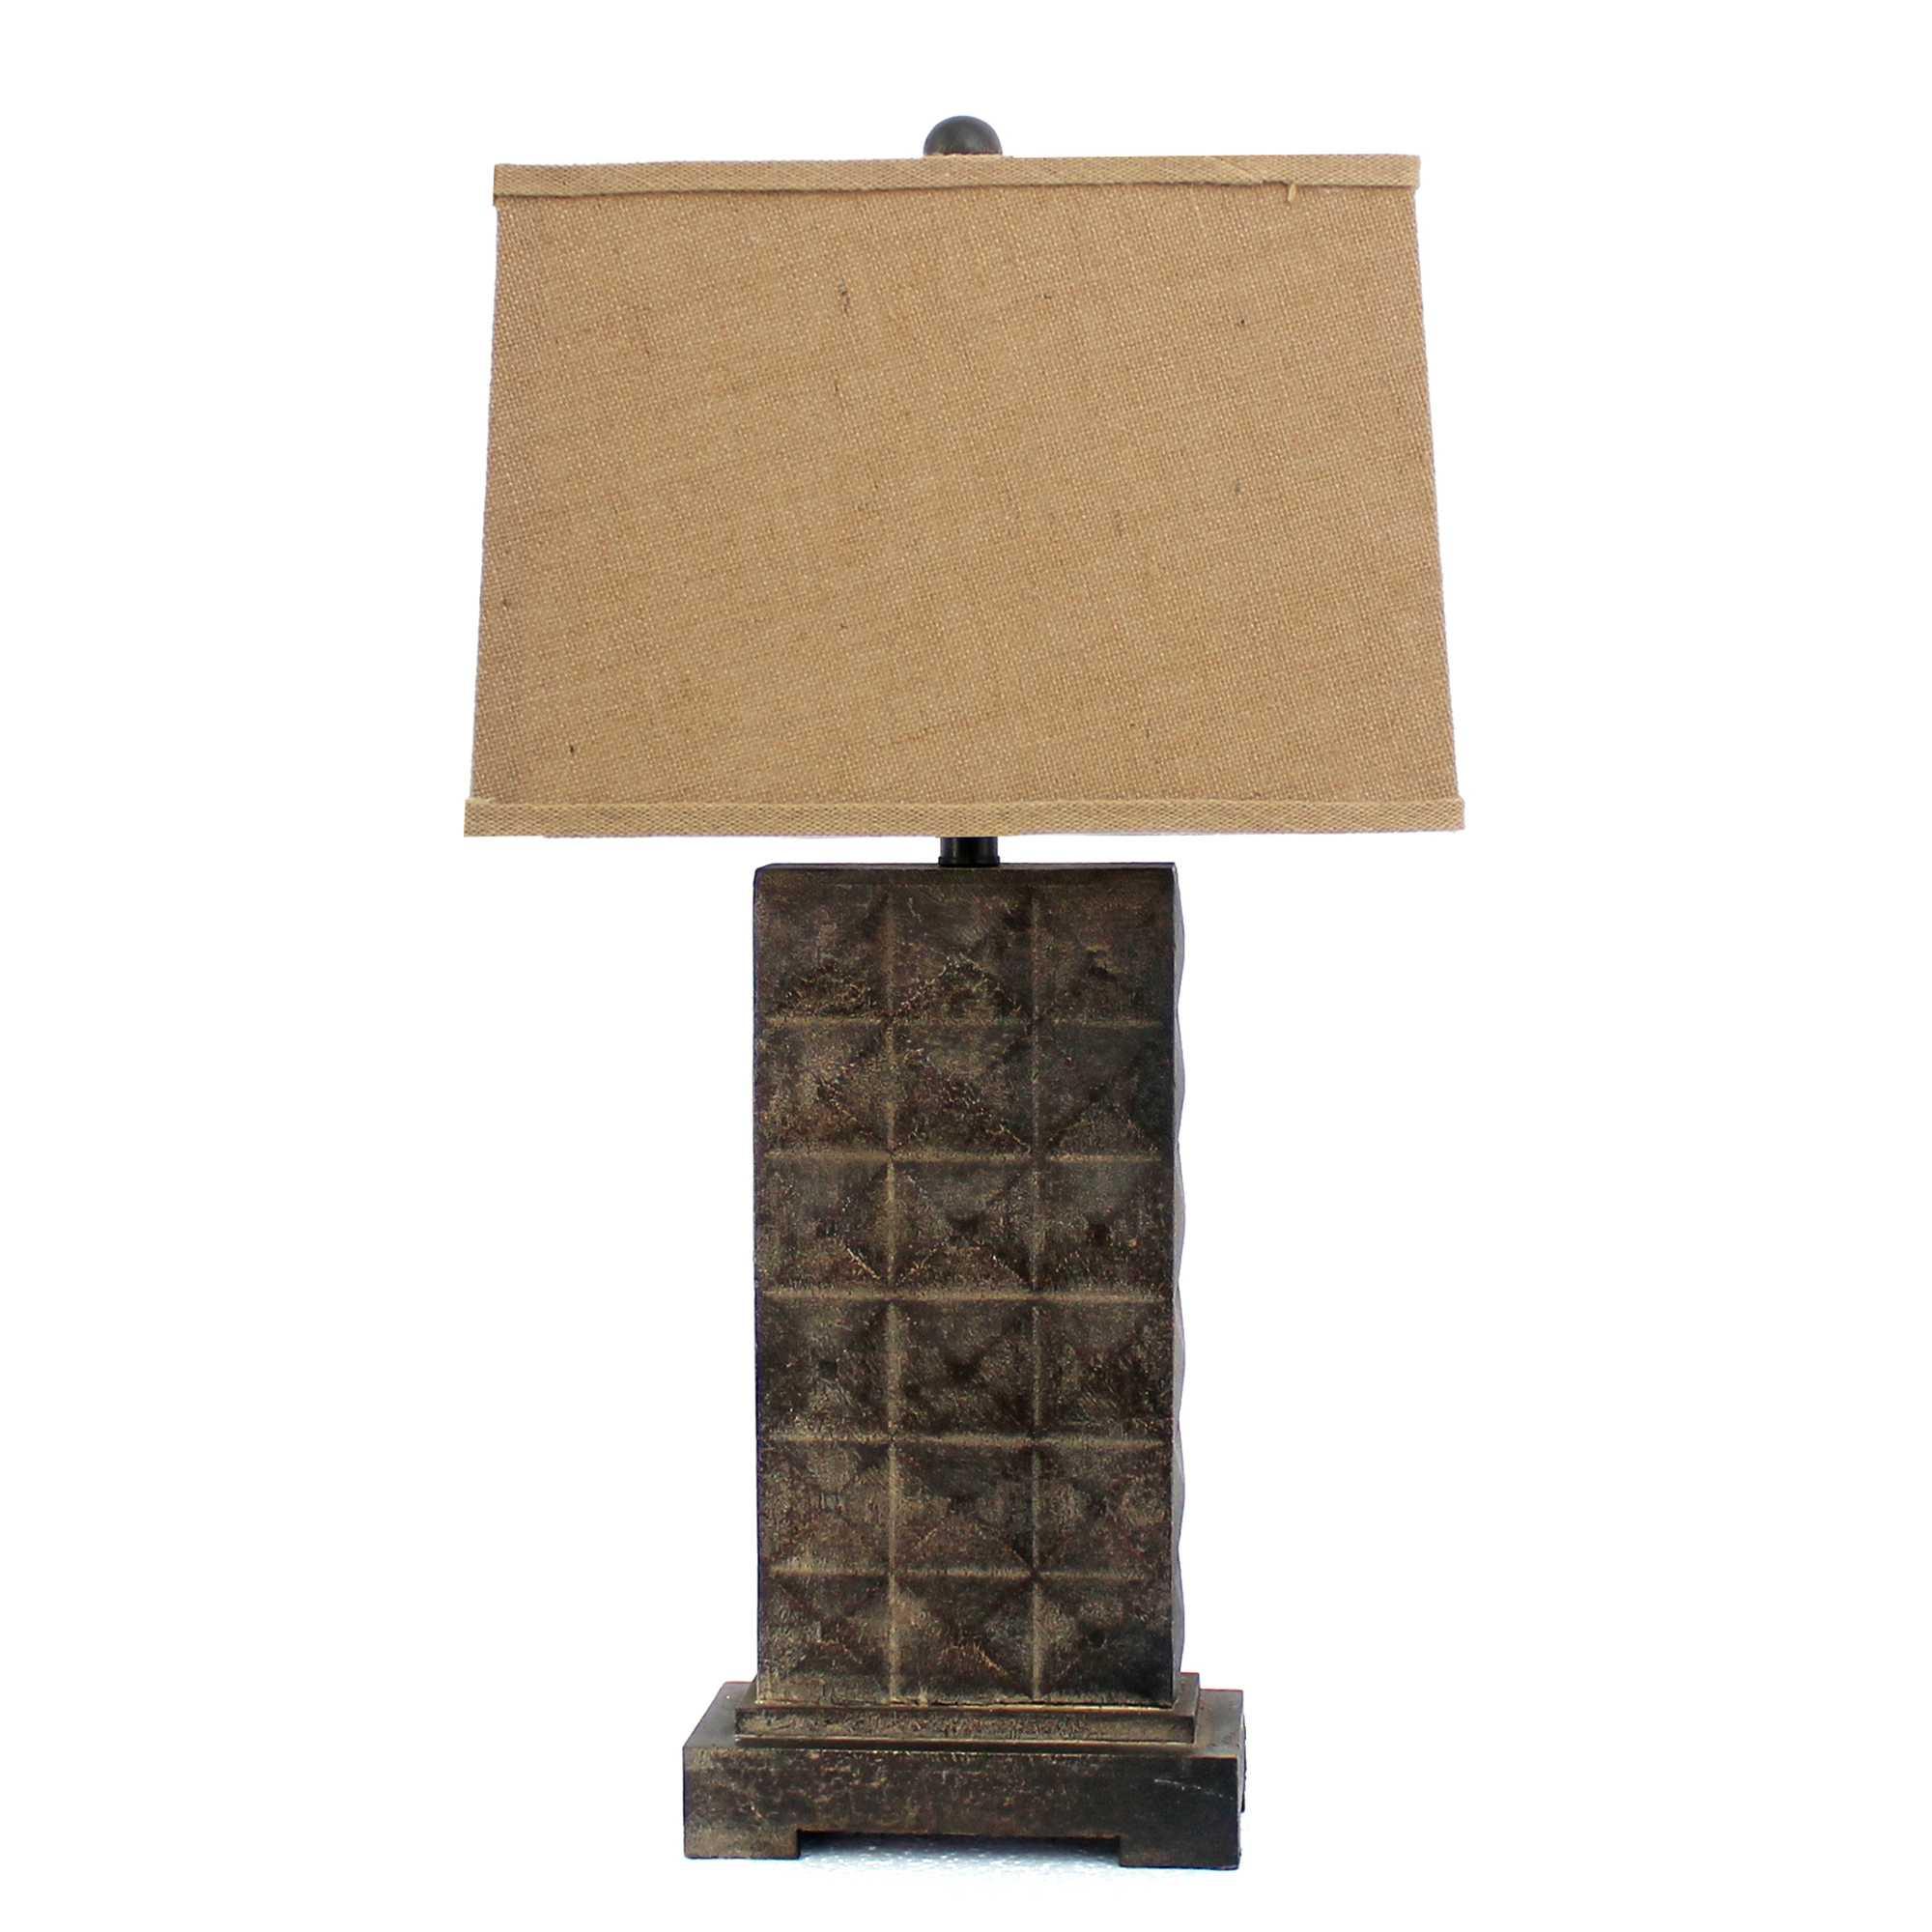 "30"" X 29"" X 8"" Brown Vintage Table Lamp With Distressed Metal Pedestal"